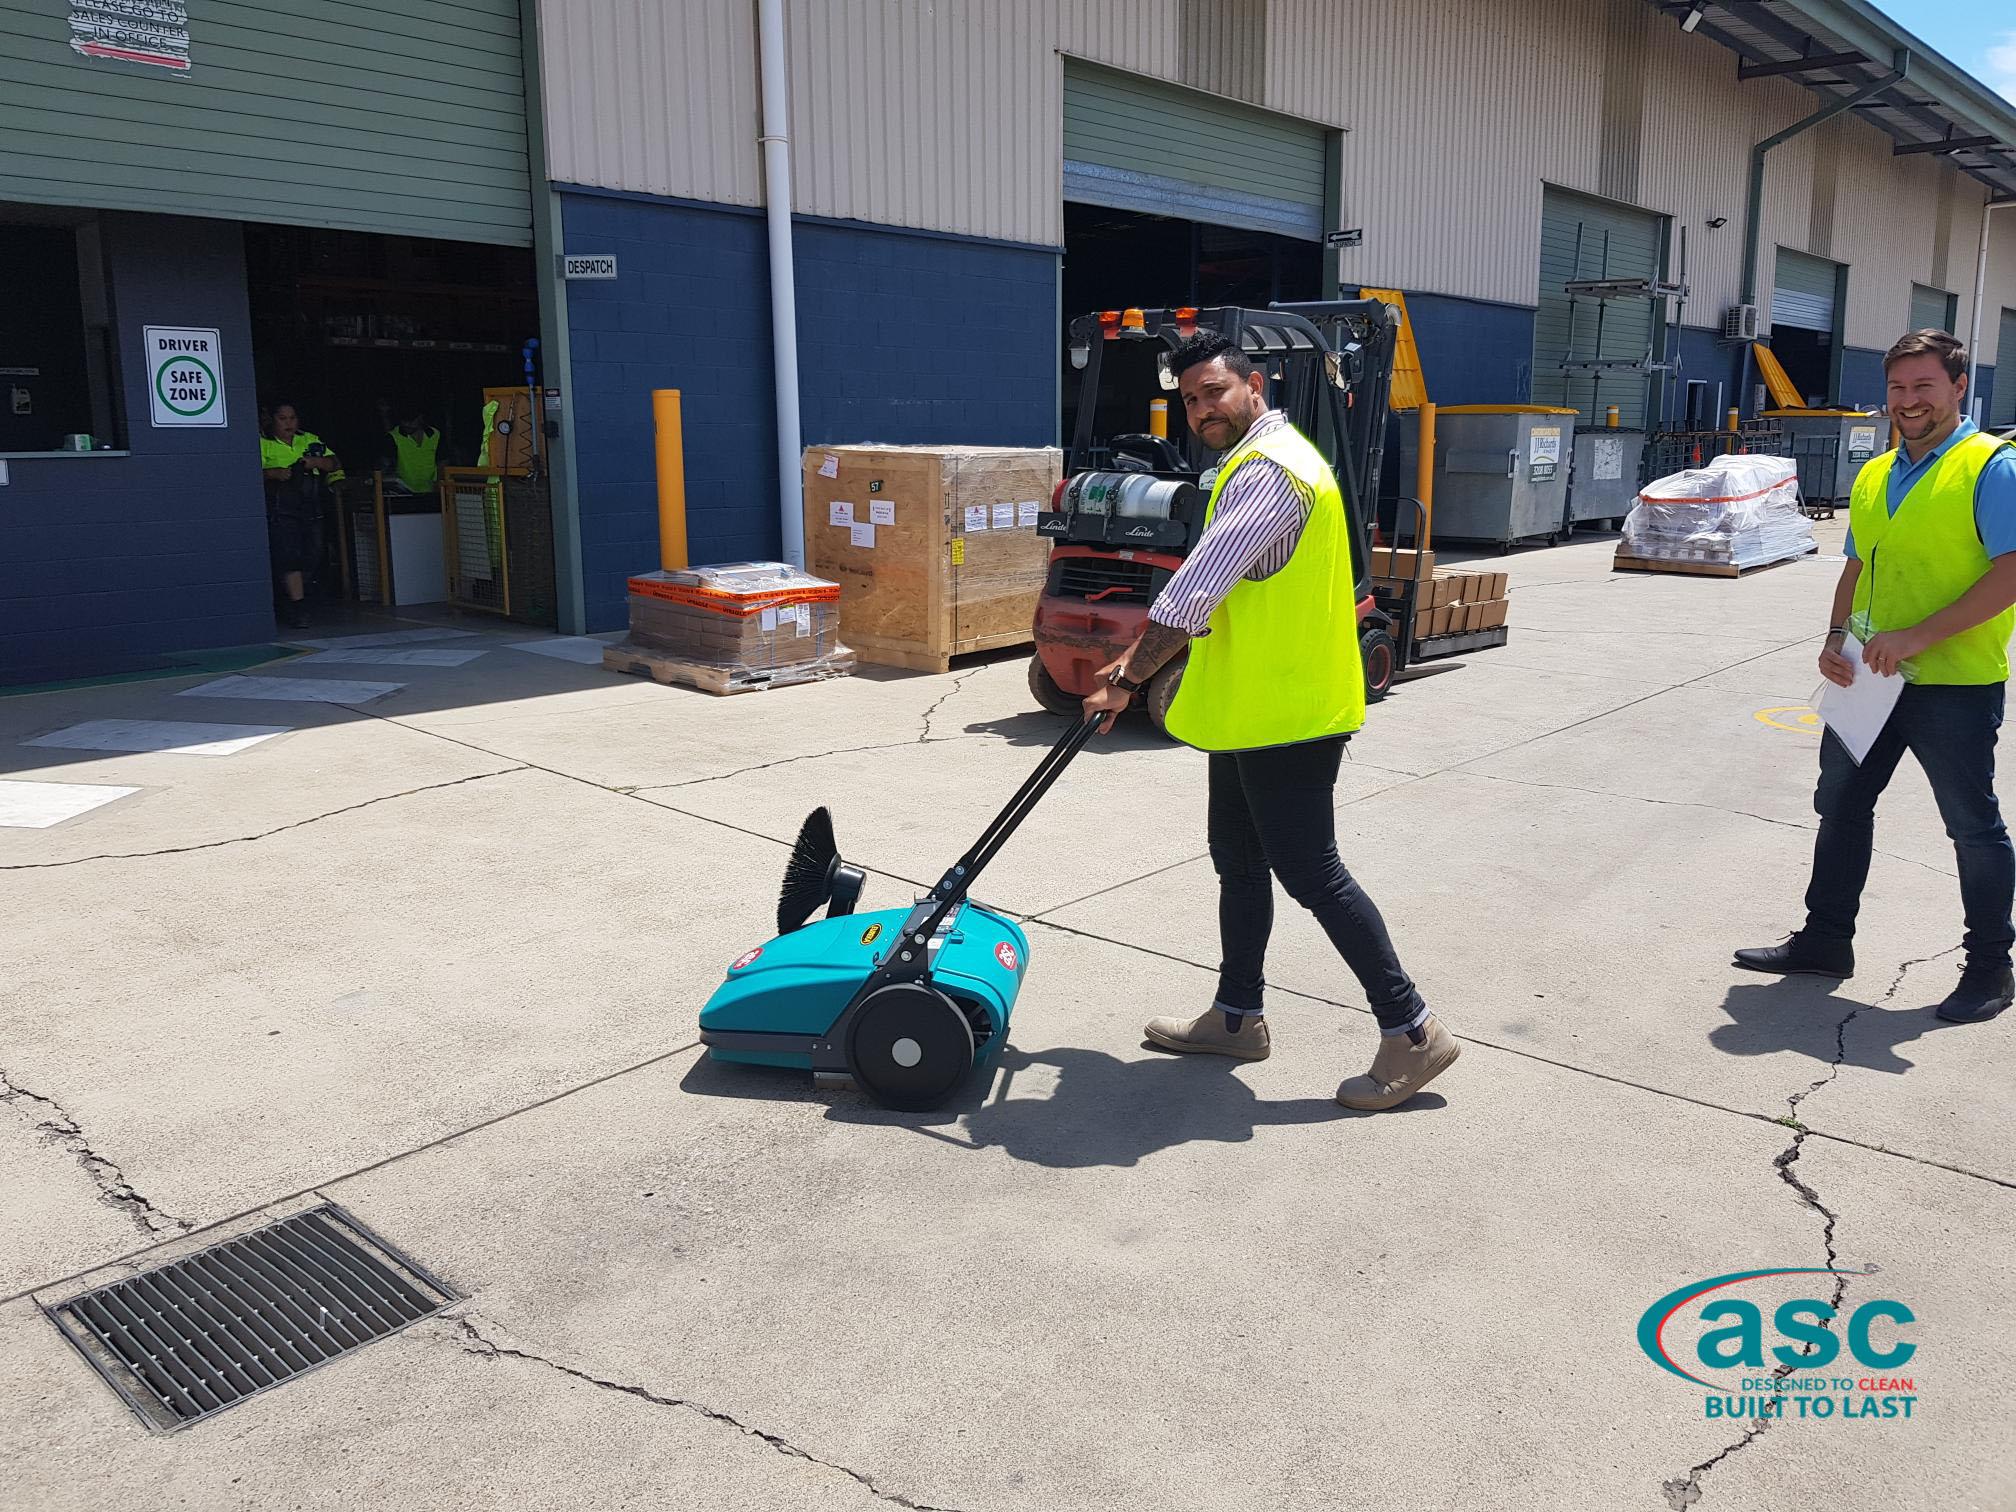 ASC MEP Push Sweeper At Kilgaro's Distribution Center 2